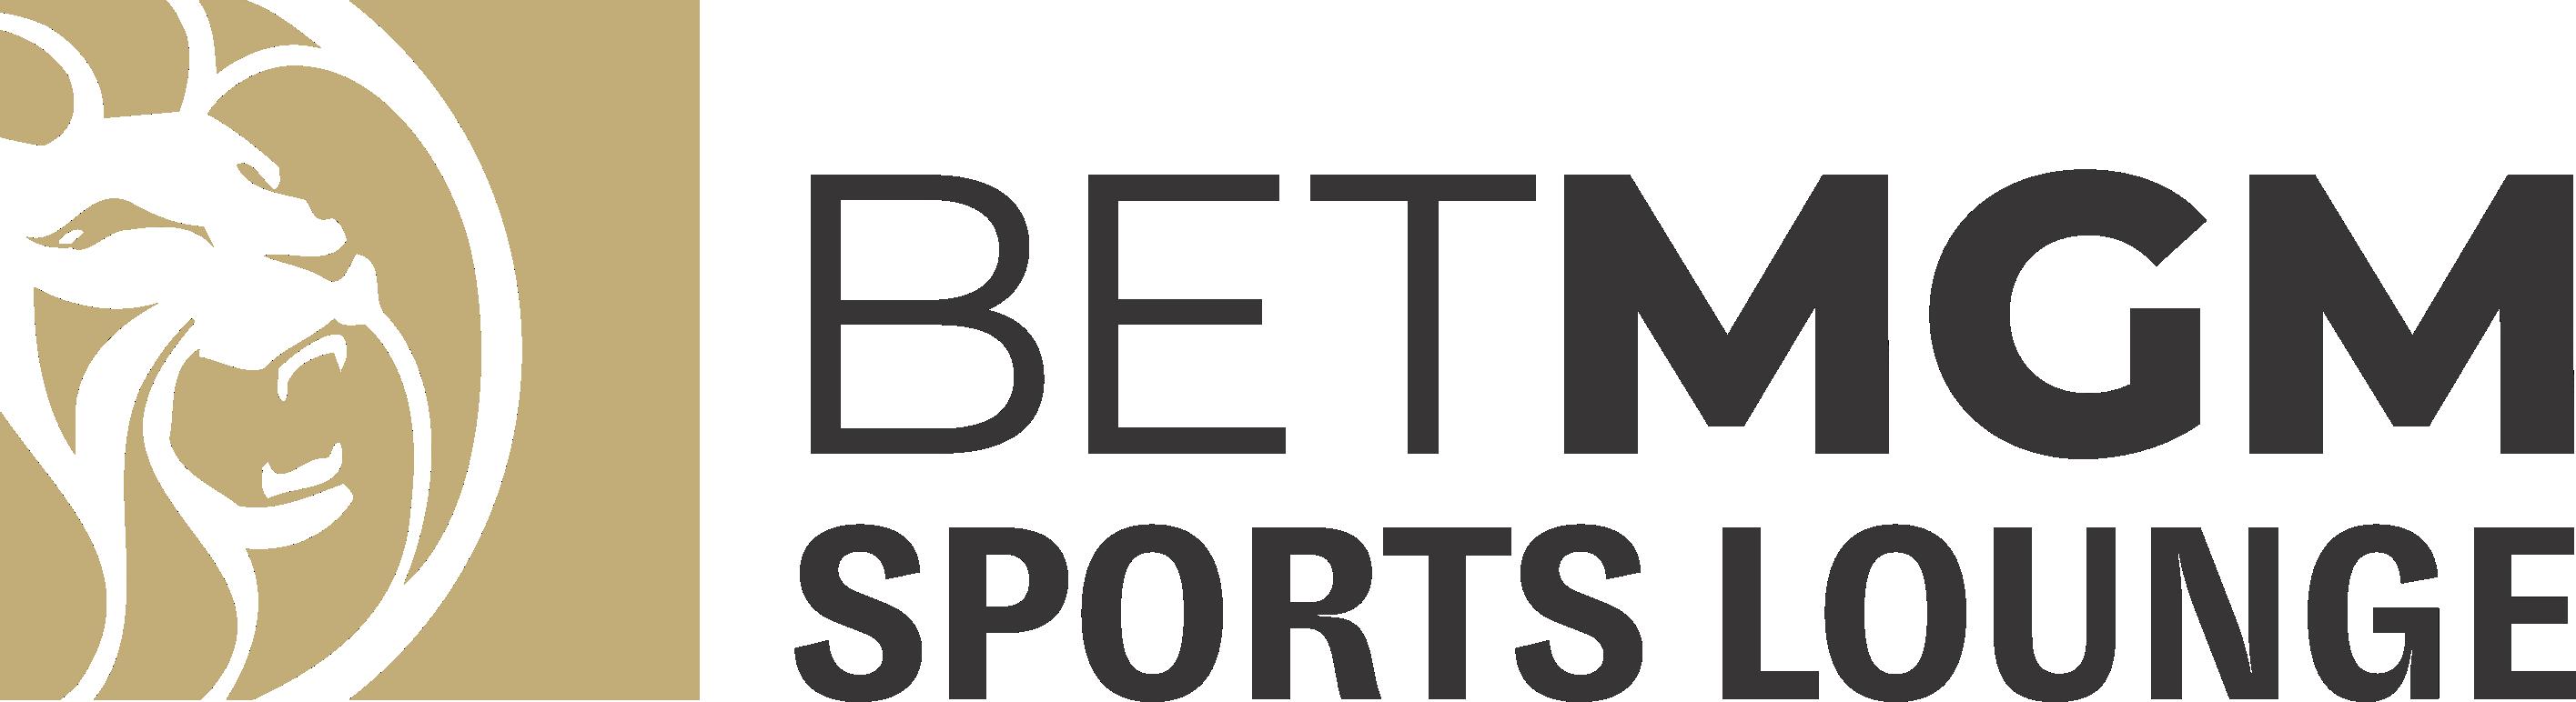 BetMGM Sports Lounge